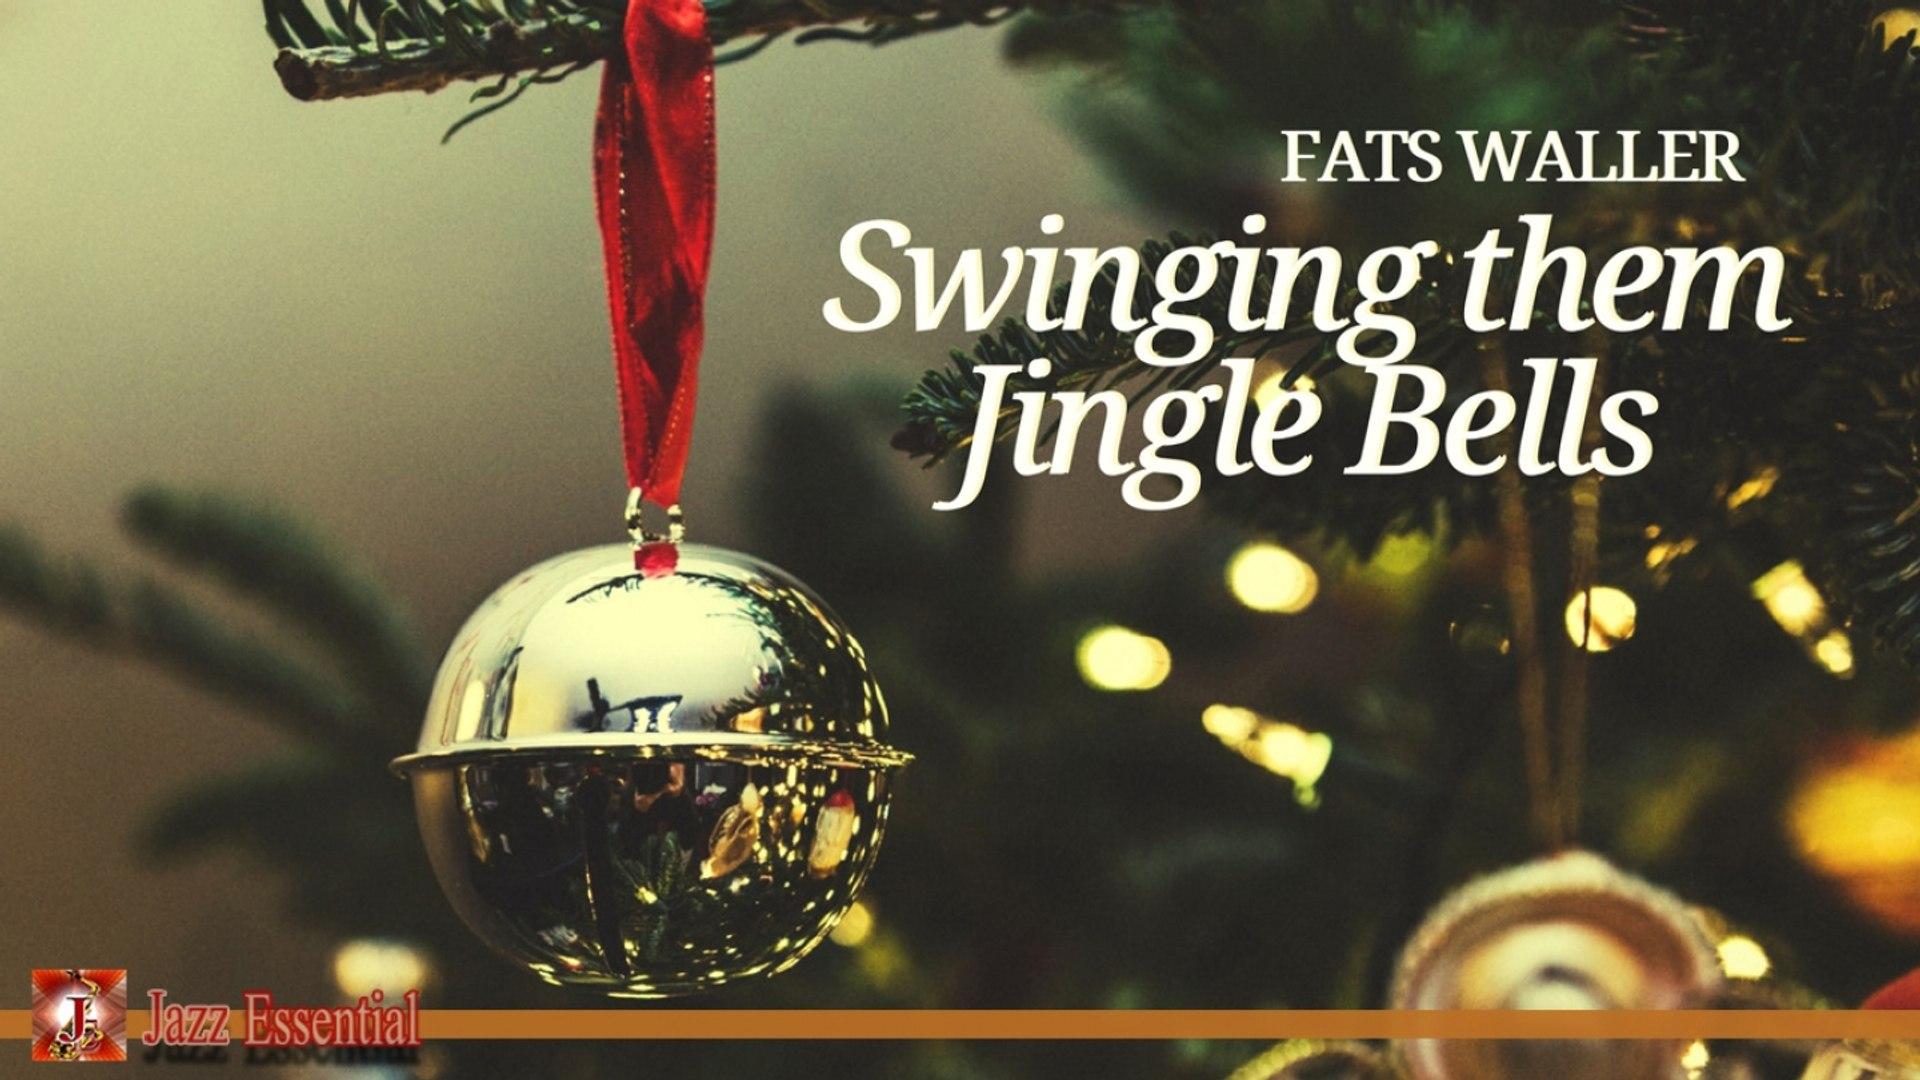 Fats Waller - Swinging Them Jingle Bells